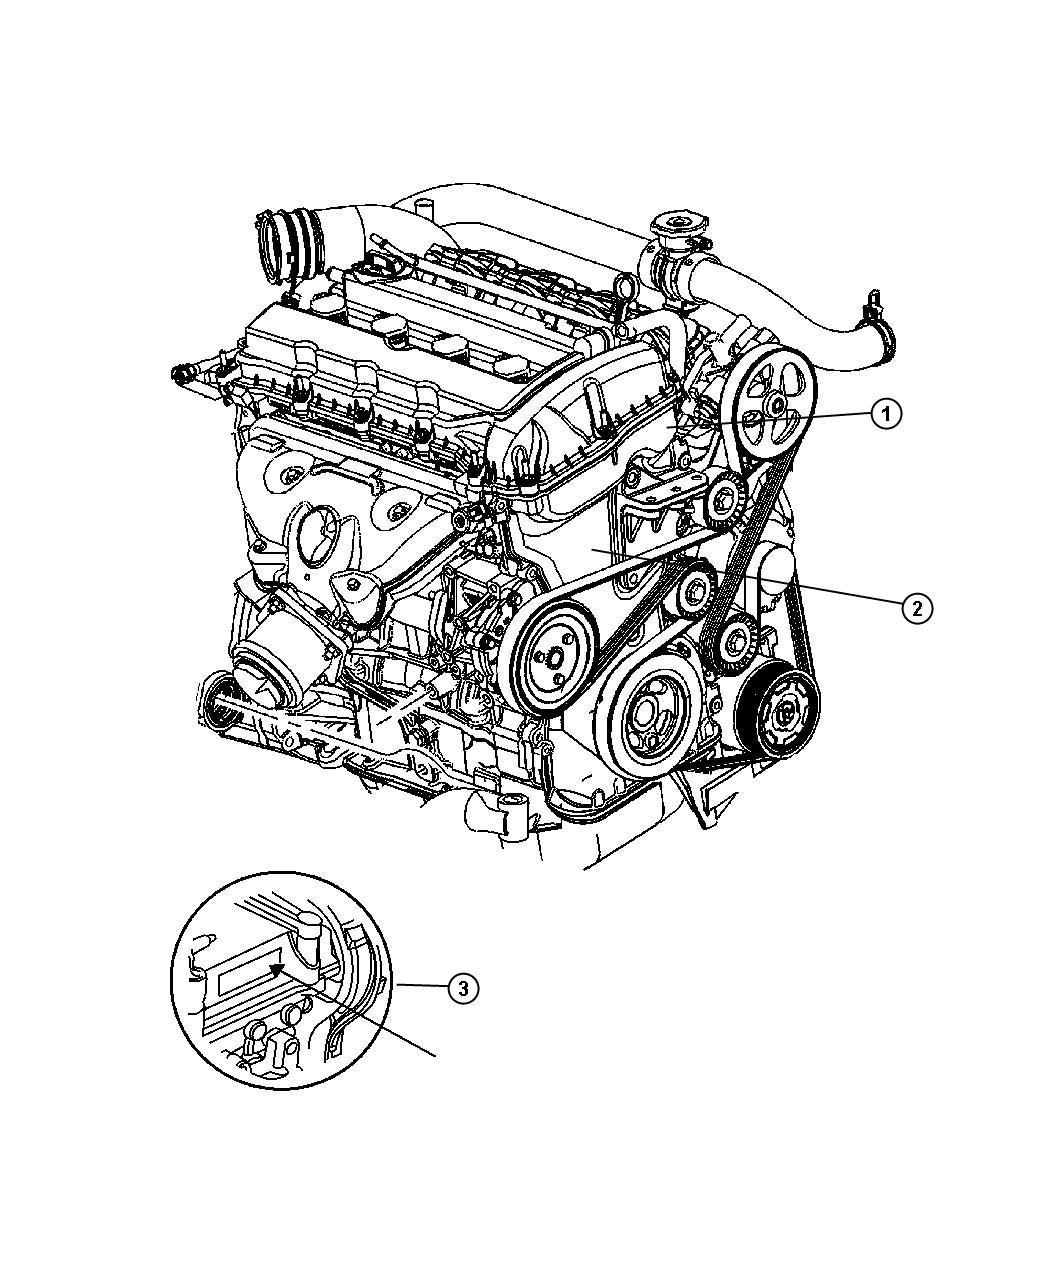 Chrysler 200 Engine Long Block Engine Oil Cooler